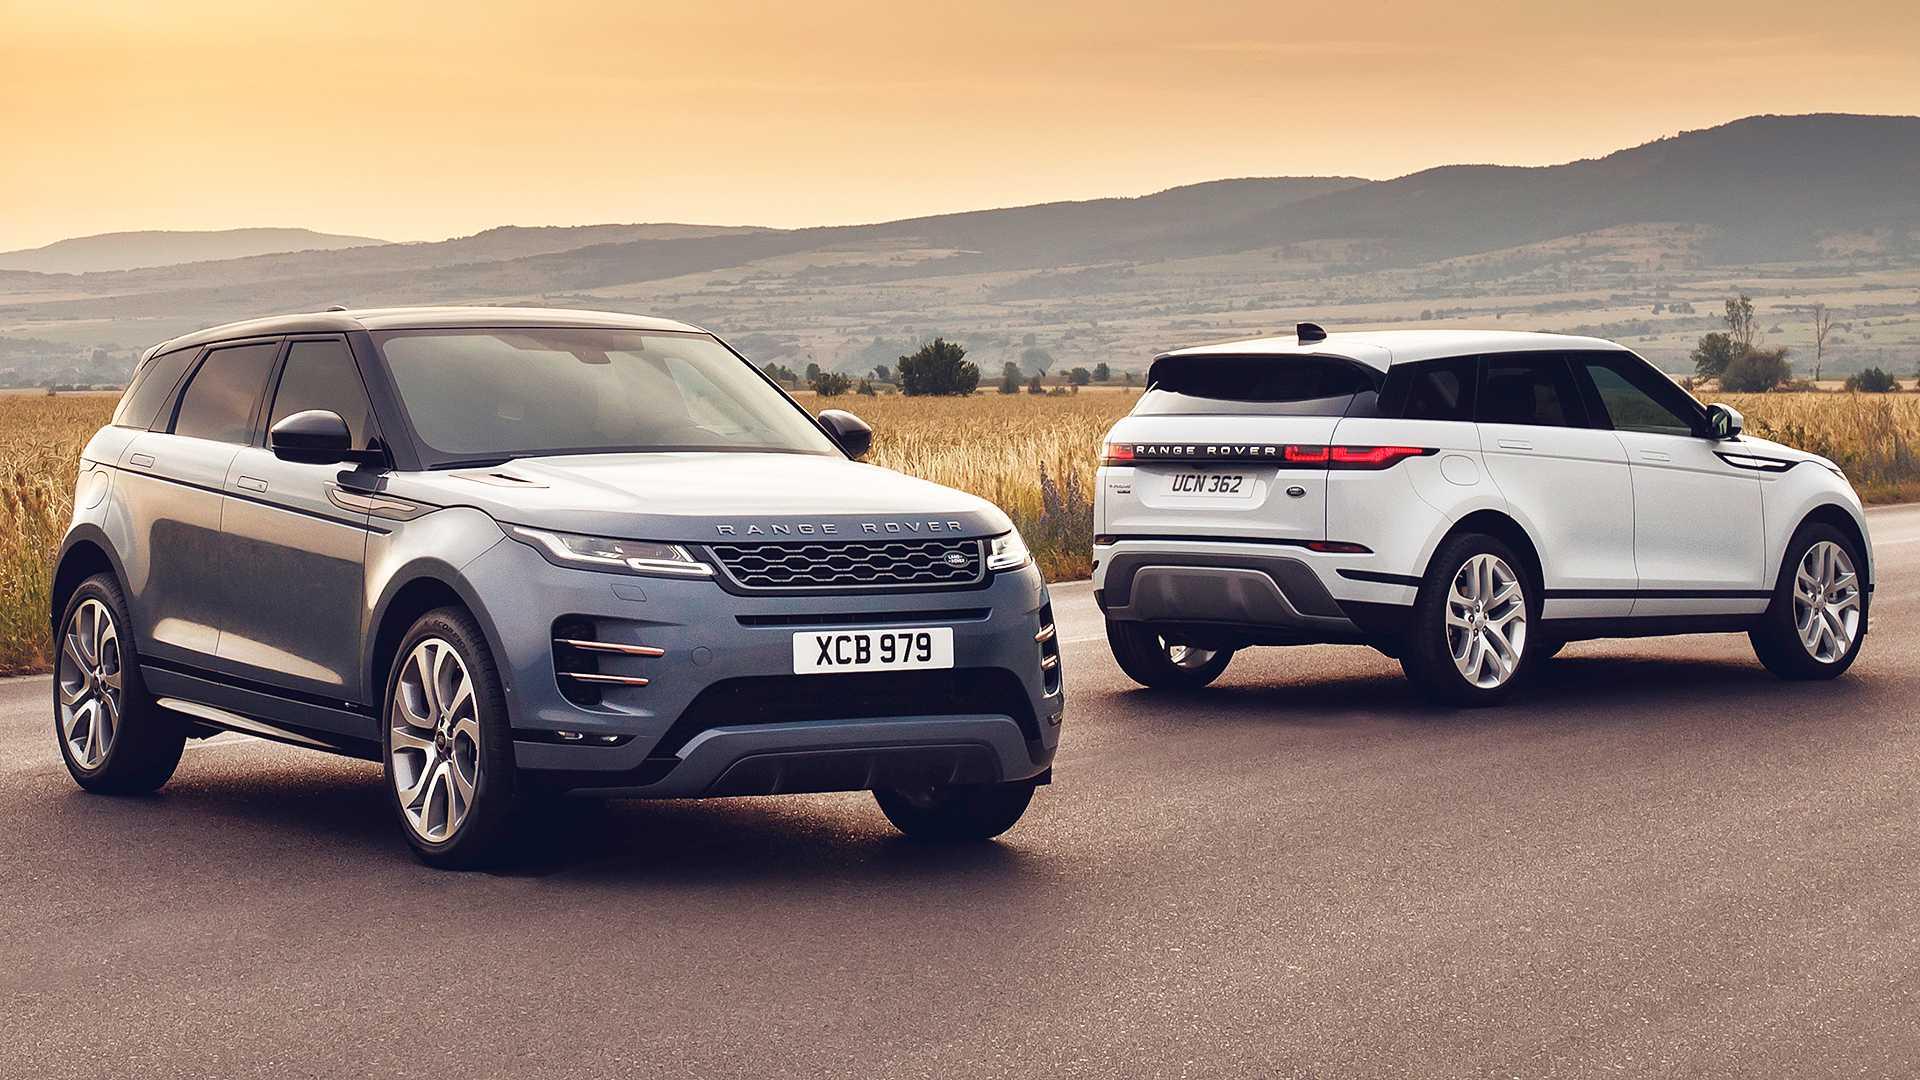 2020-range-rover-evoque (64)